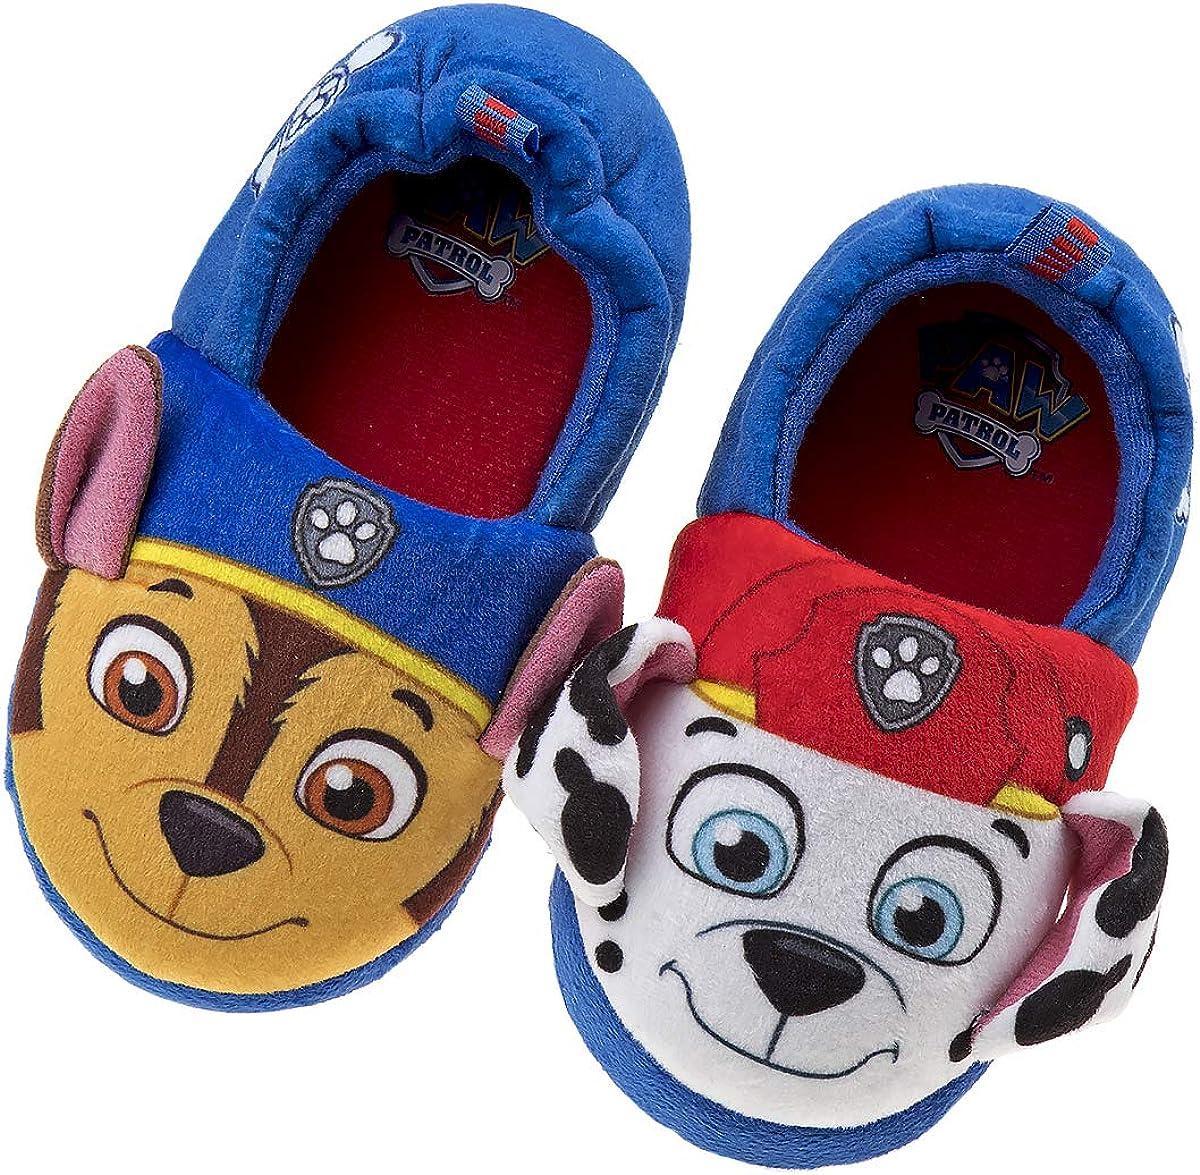 Nickelodeon Paw Patrol Boys and Girls Plush Slip On Slippers Toddler//Little Kid